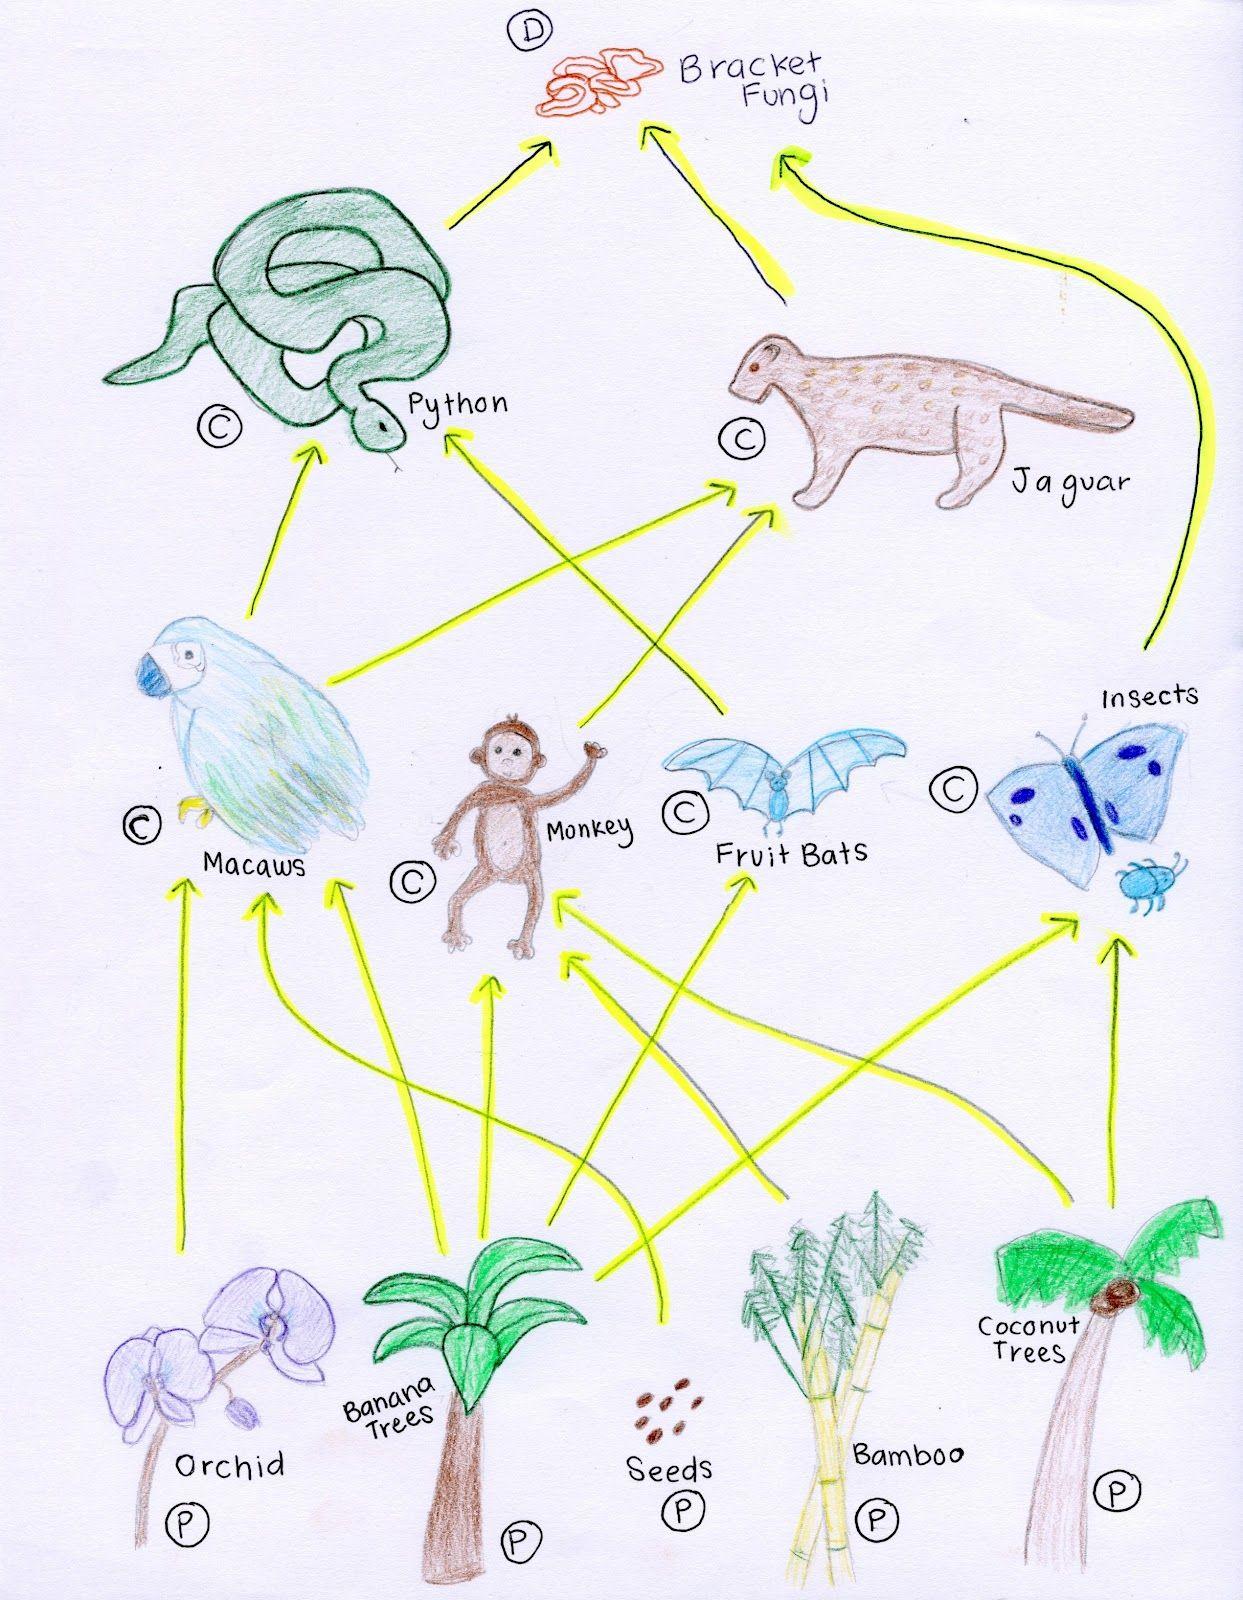 Tropical Rainforest Food Web Diagram Foot Skeleton A Z Art Of Teaching Pinterest